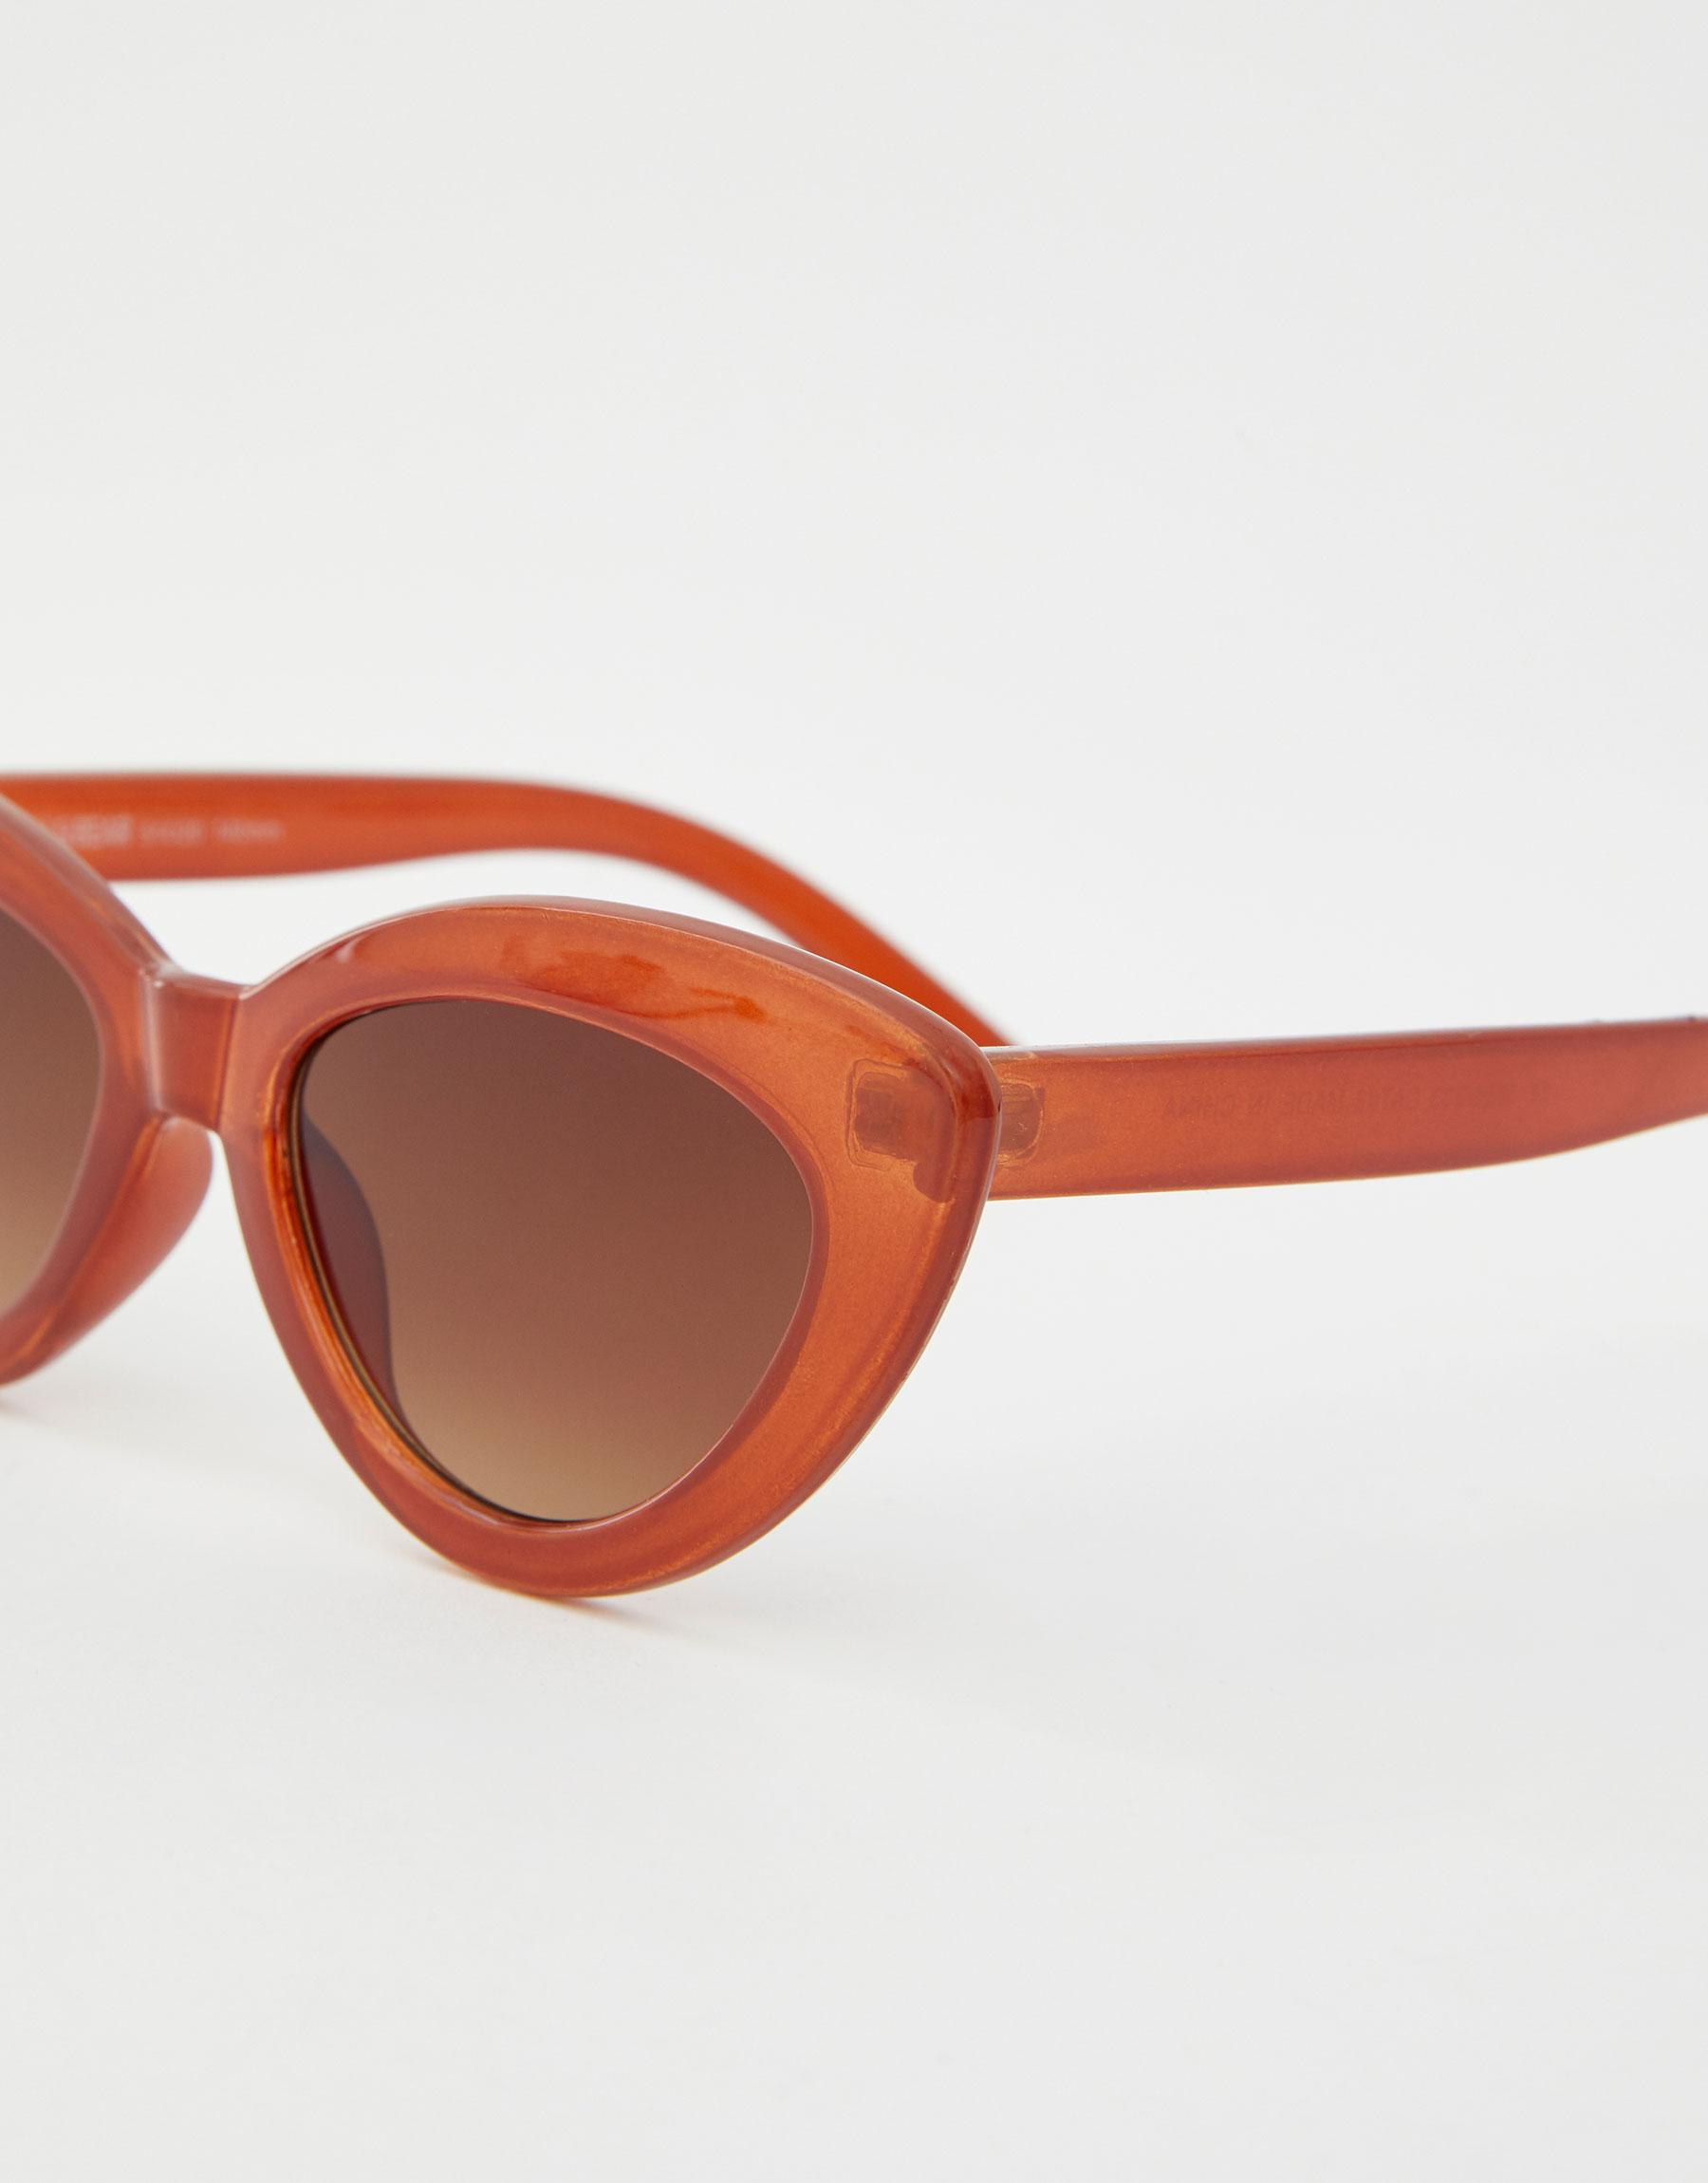 95041ef62cb7 Modalite - Pullbear Caramel-coloured cat-eye sunglasses